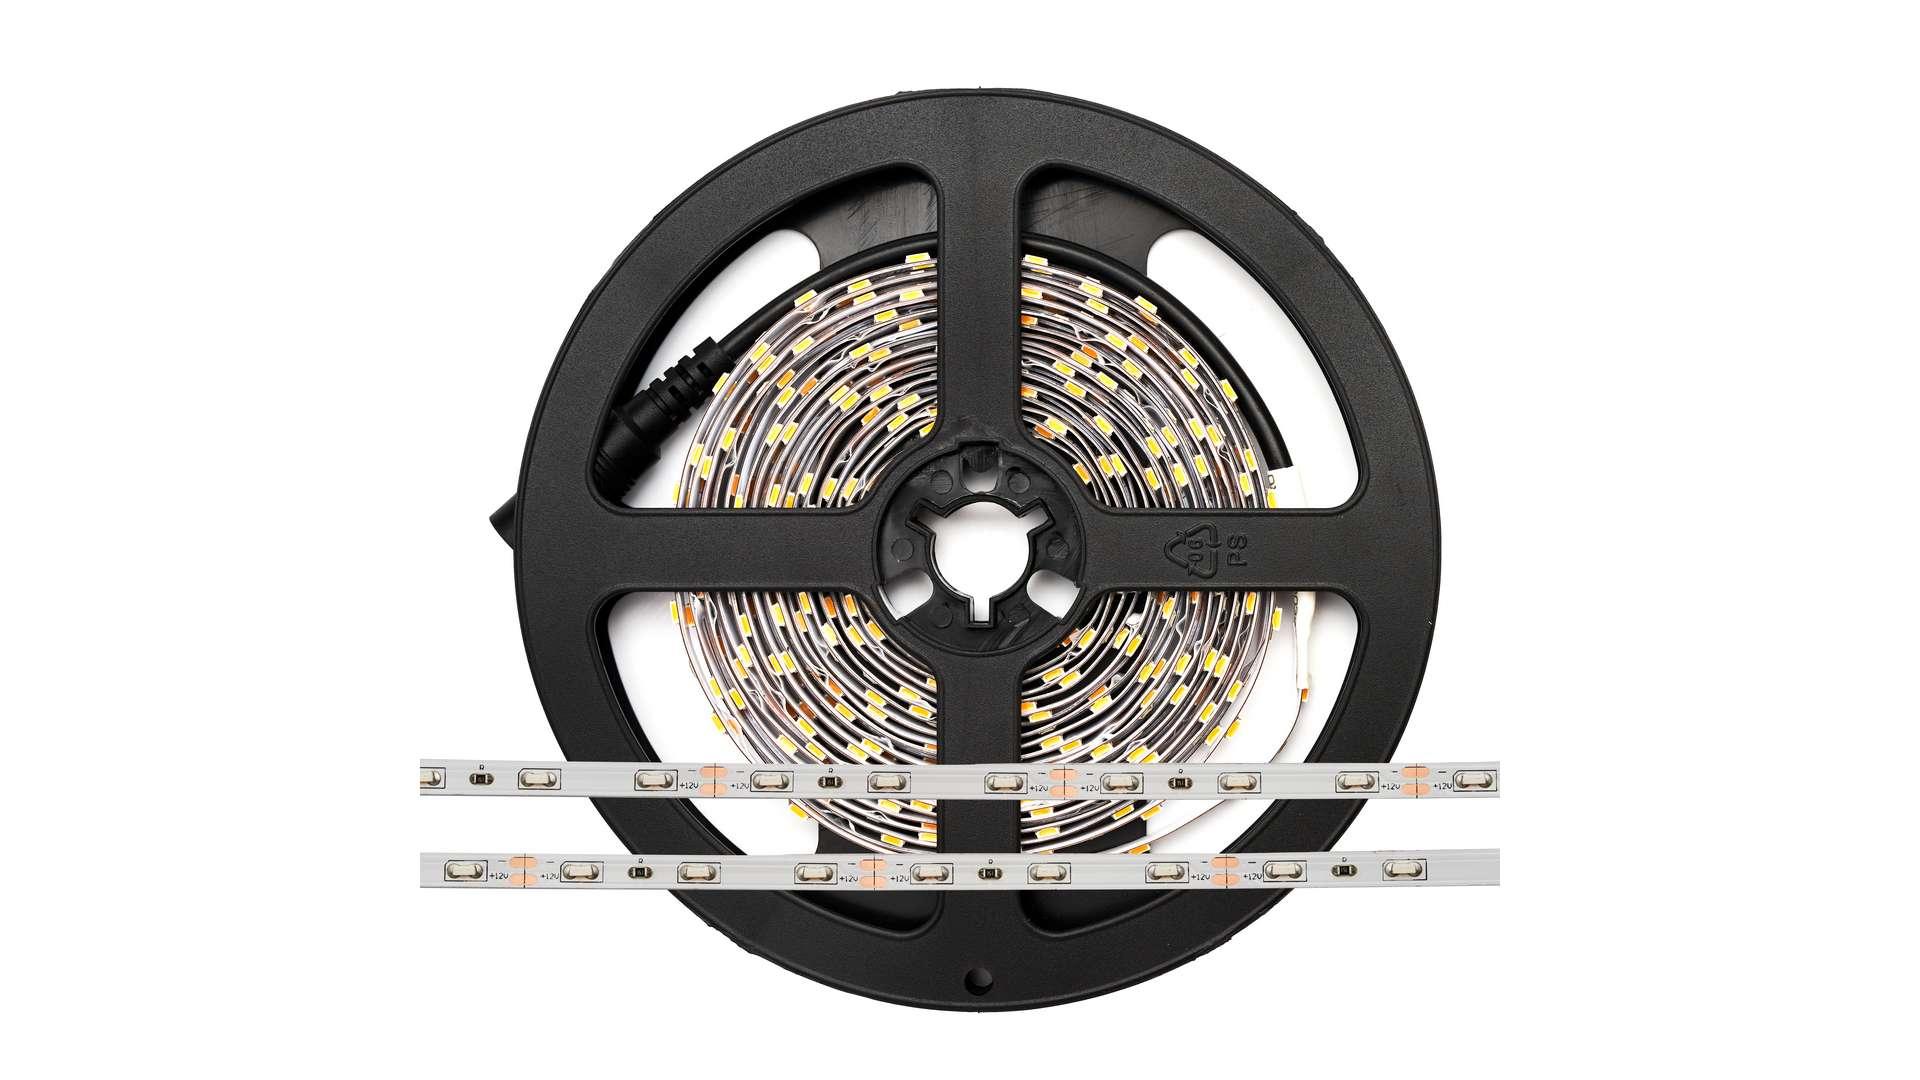 Taśma boczna 300 LED 60 LED/m 335 SMD, B. Zimna